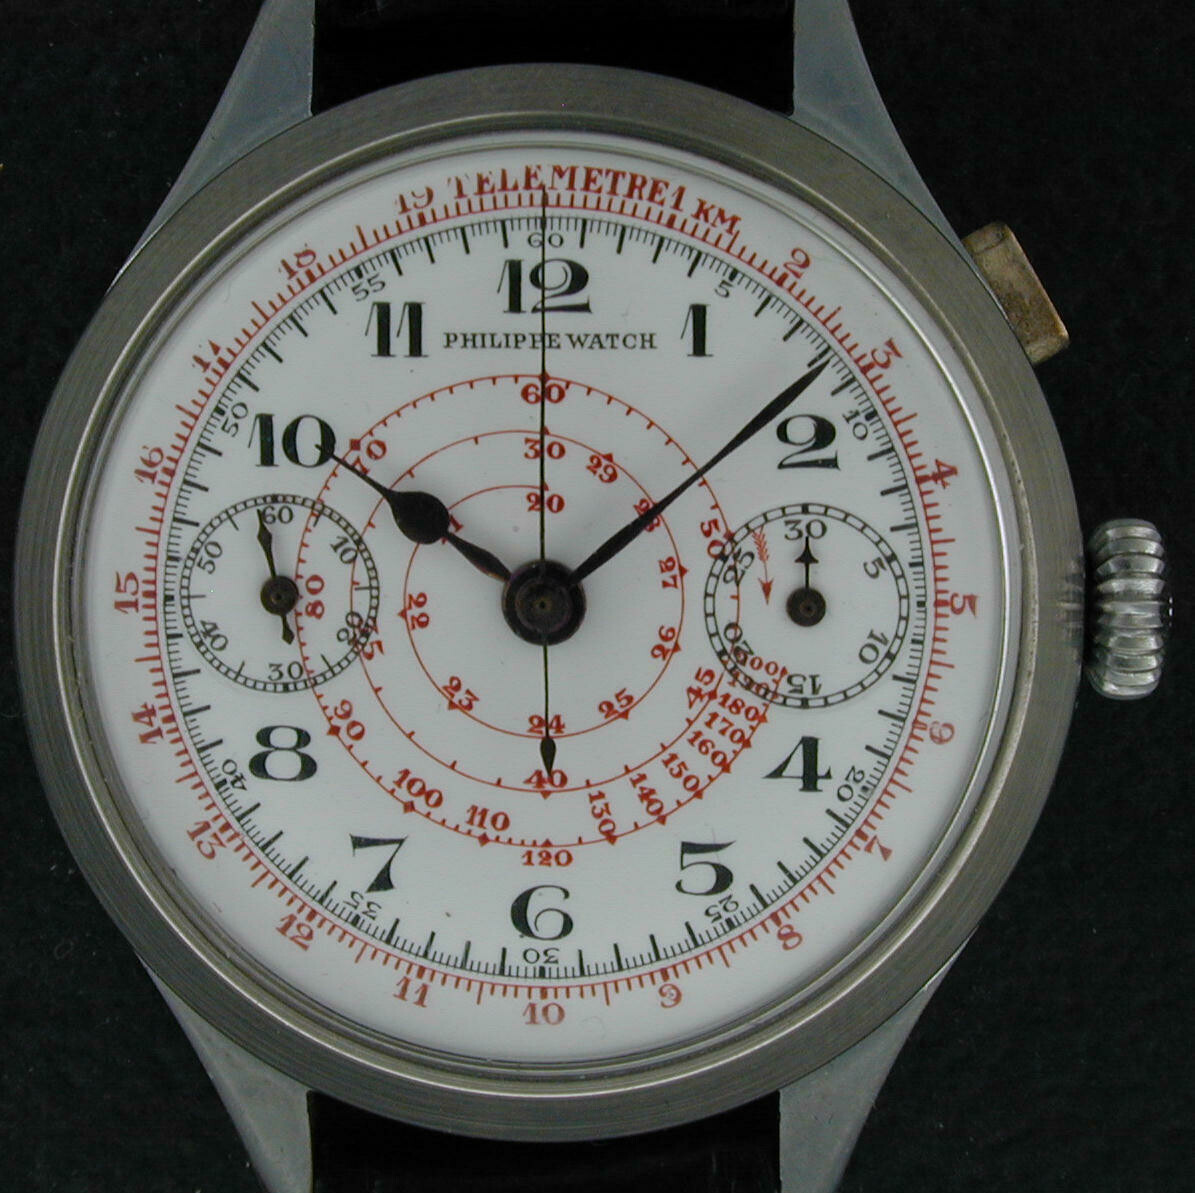 Philippe Single Button Chronograph Porcelain dial